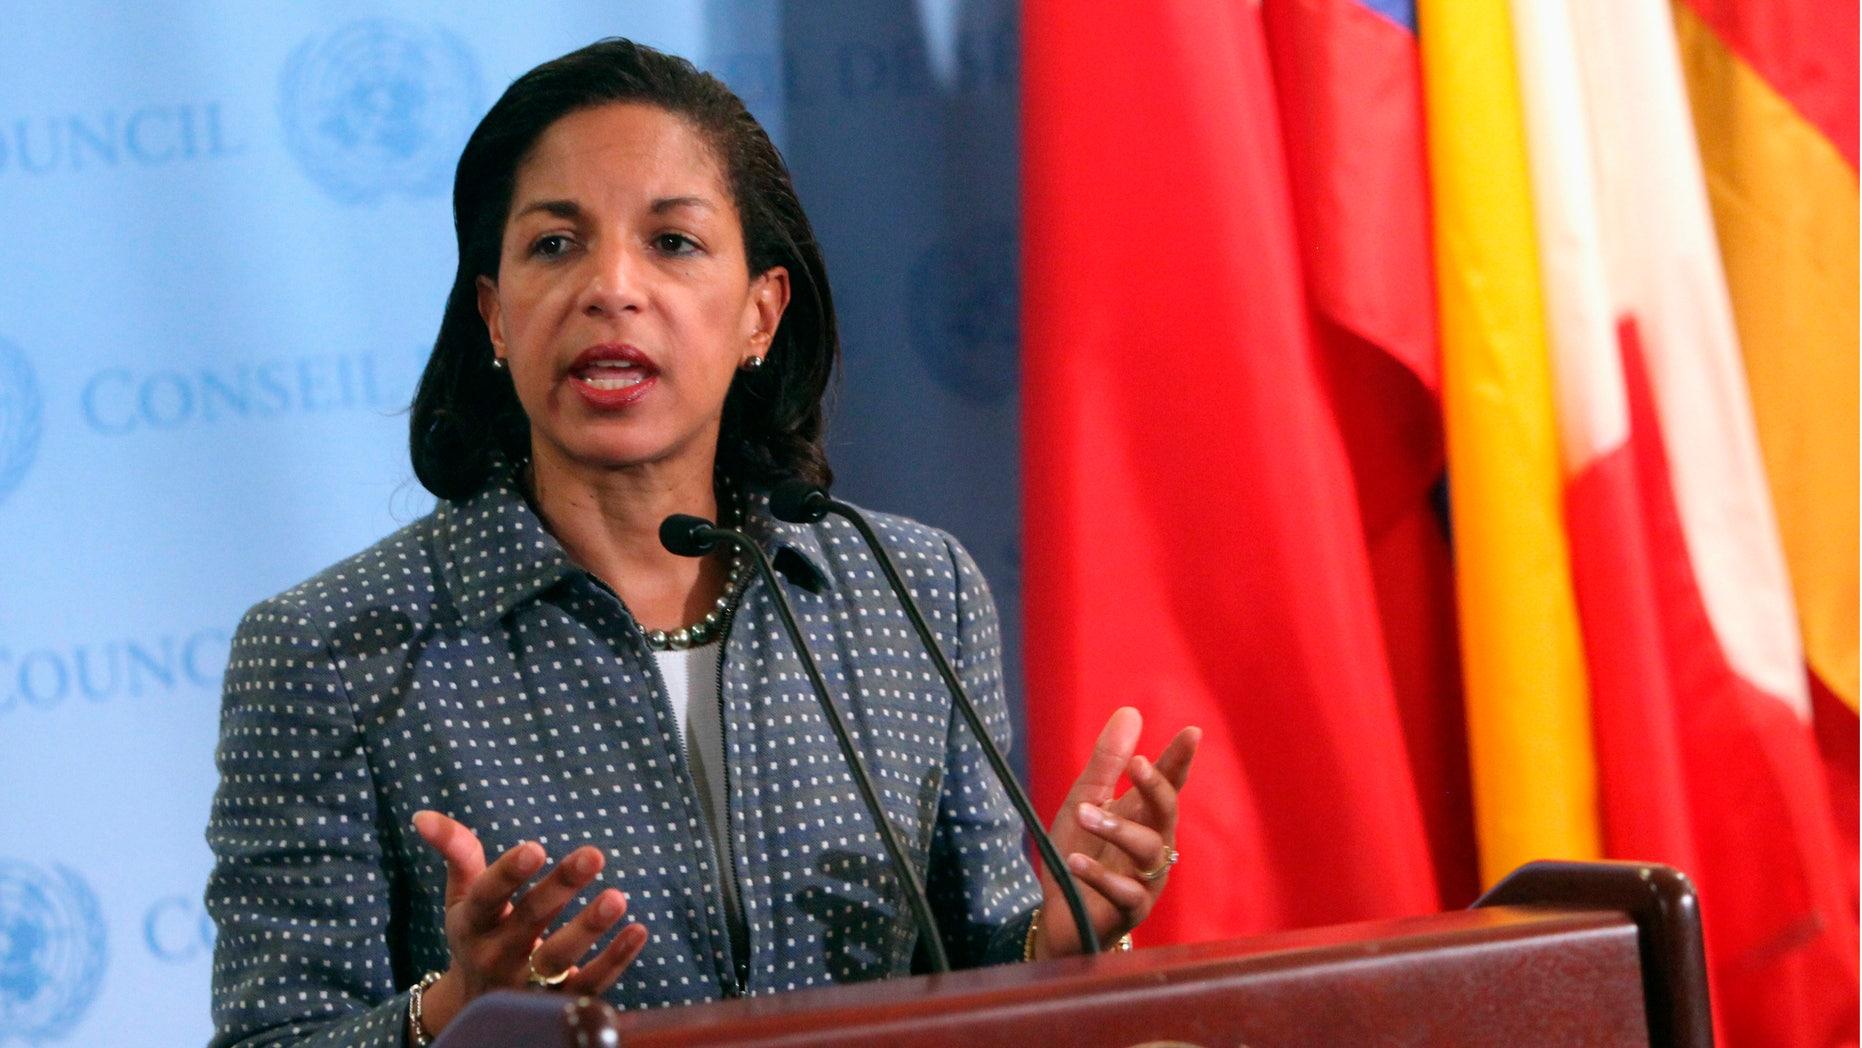 FILE: June 7, 2012: Susan Rice, U.S. ambassador to the United Nations, speaks at U.N. headquarters in New York.